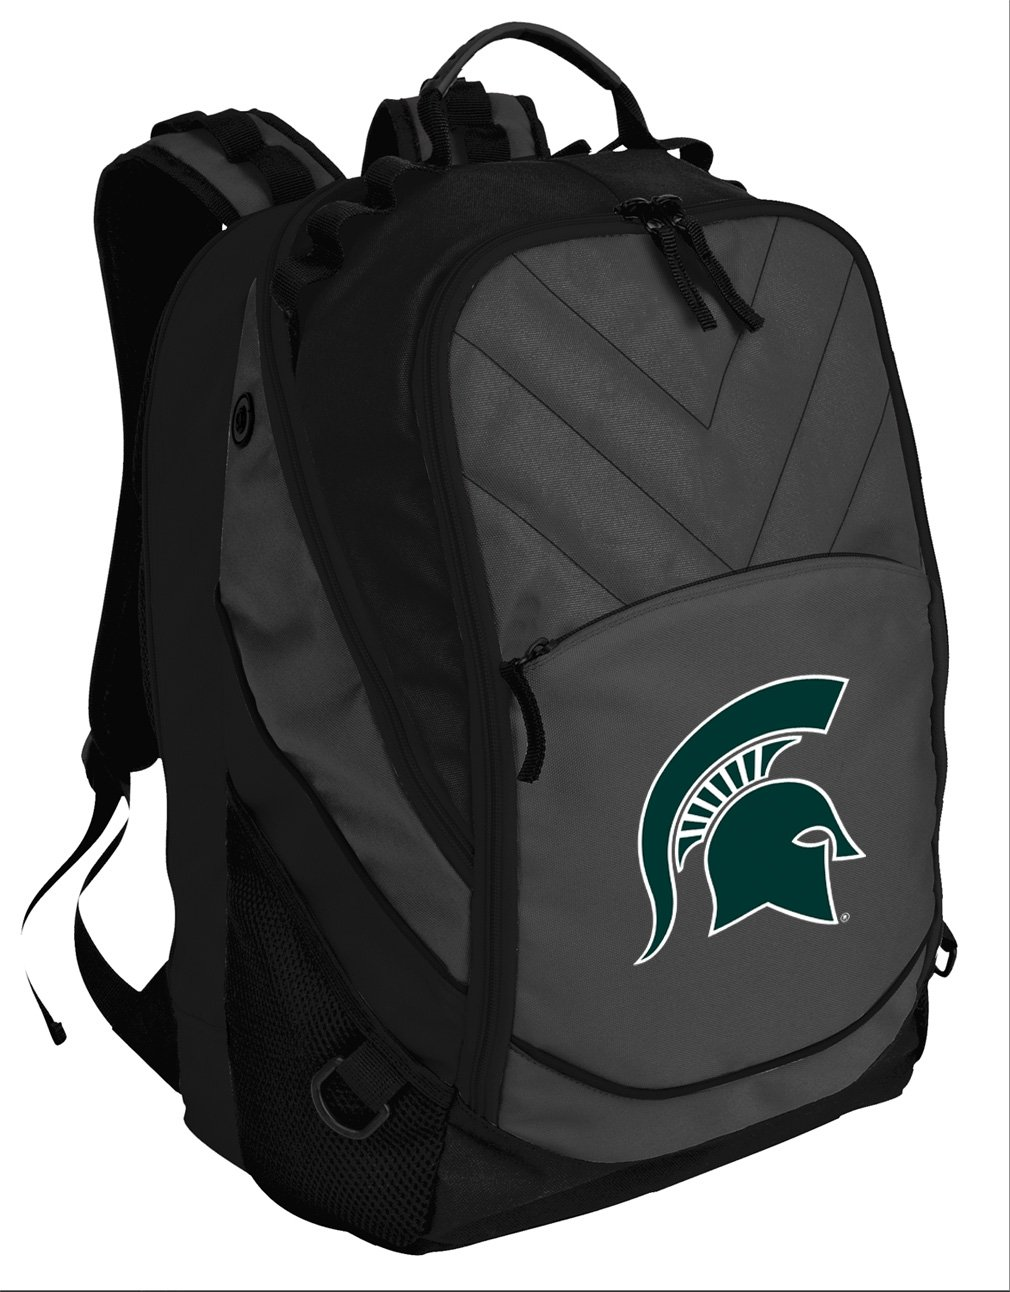 Broad Bay BEST Michigan State University Backpack Laptop Computer Bag